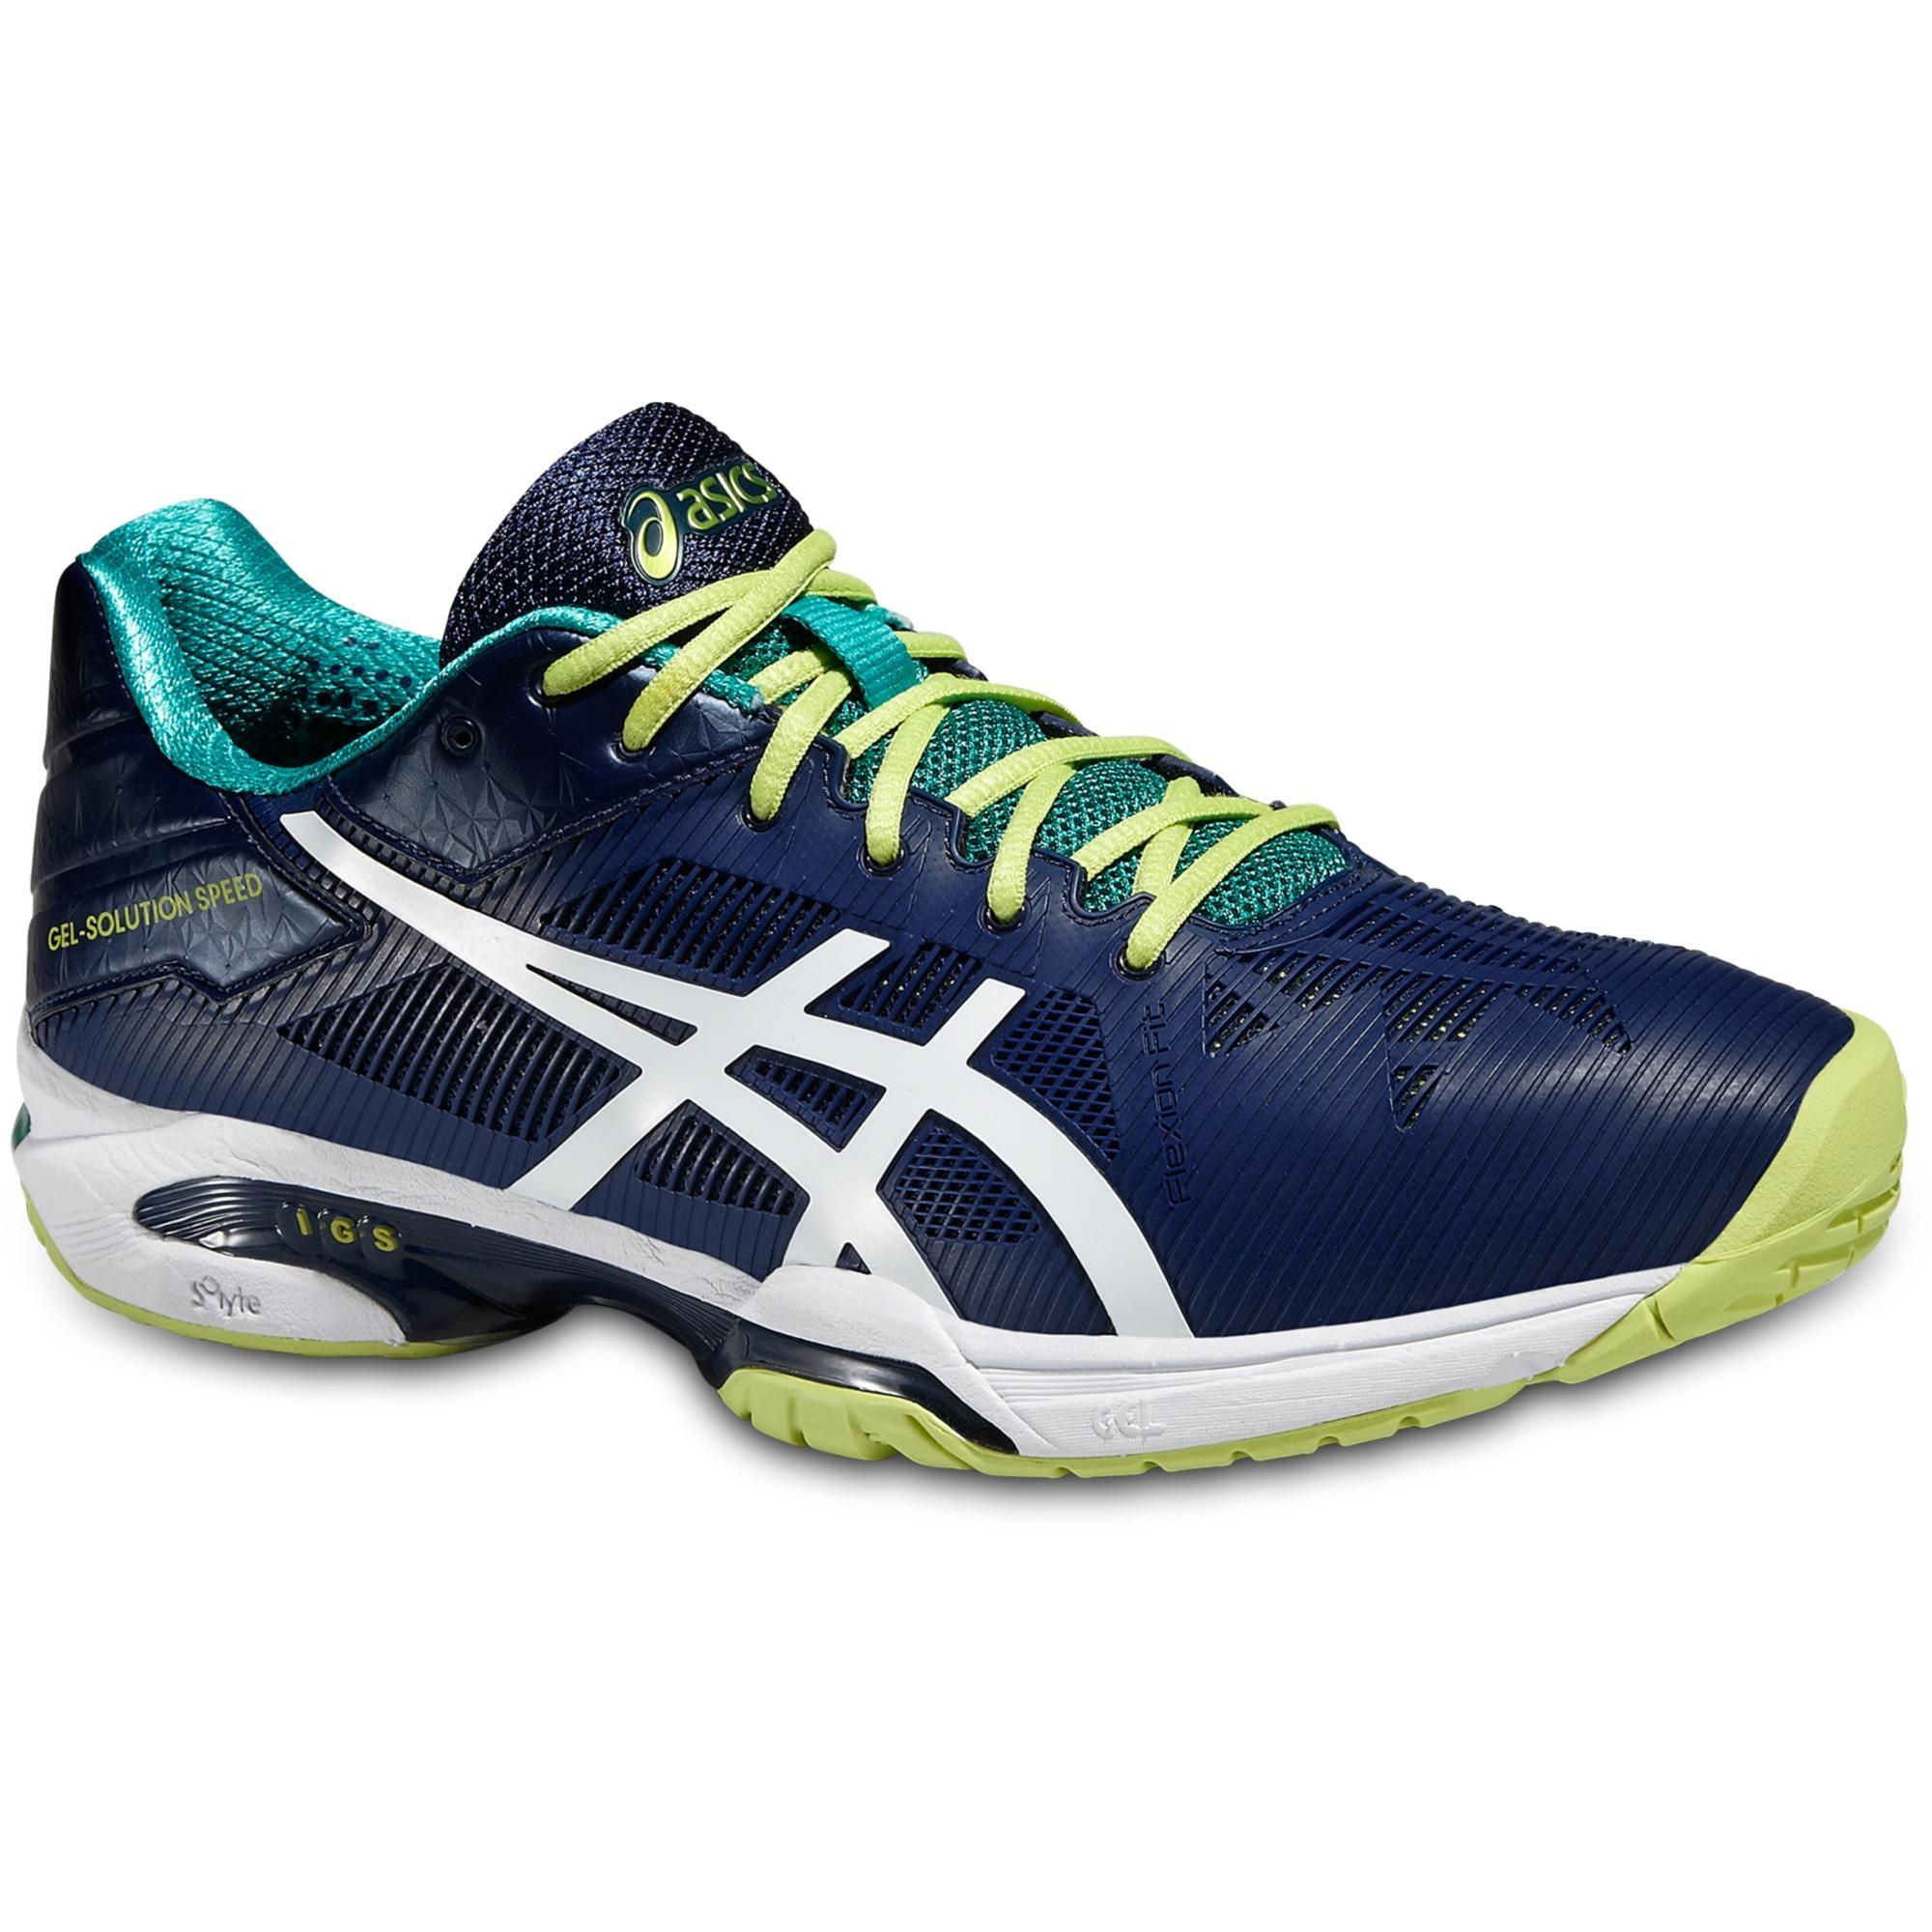 Asics Mens GEL Solution Speed 3 Tennis Shoes BlueWhiteLime